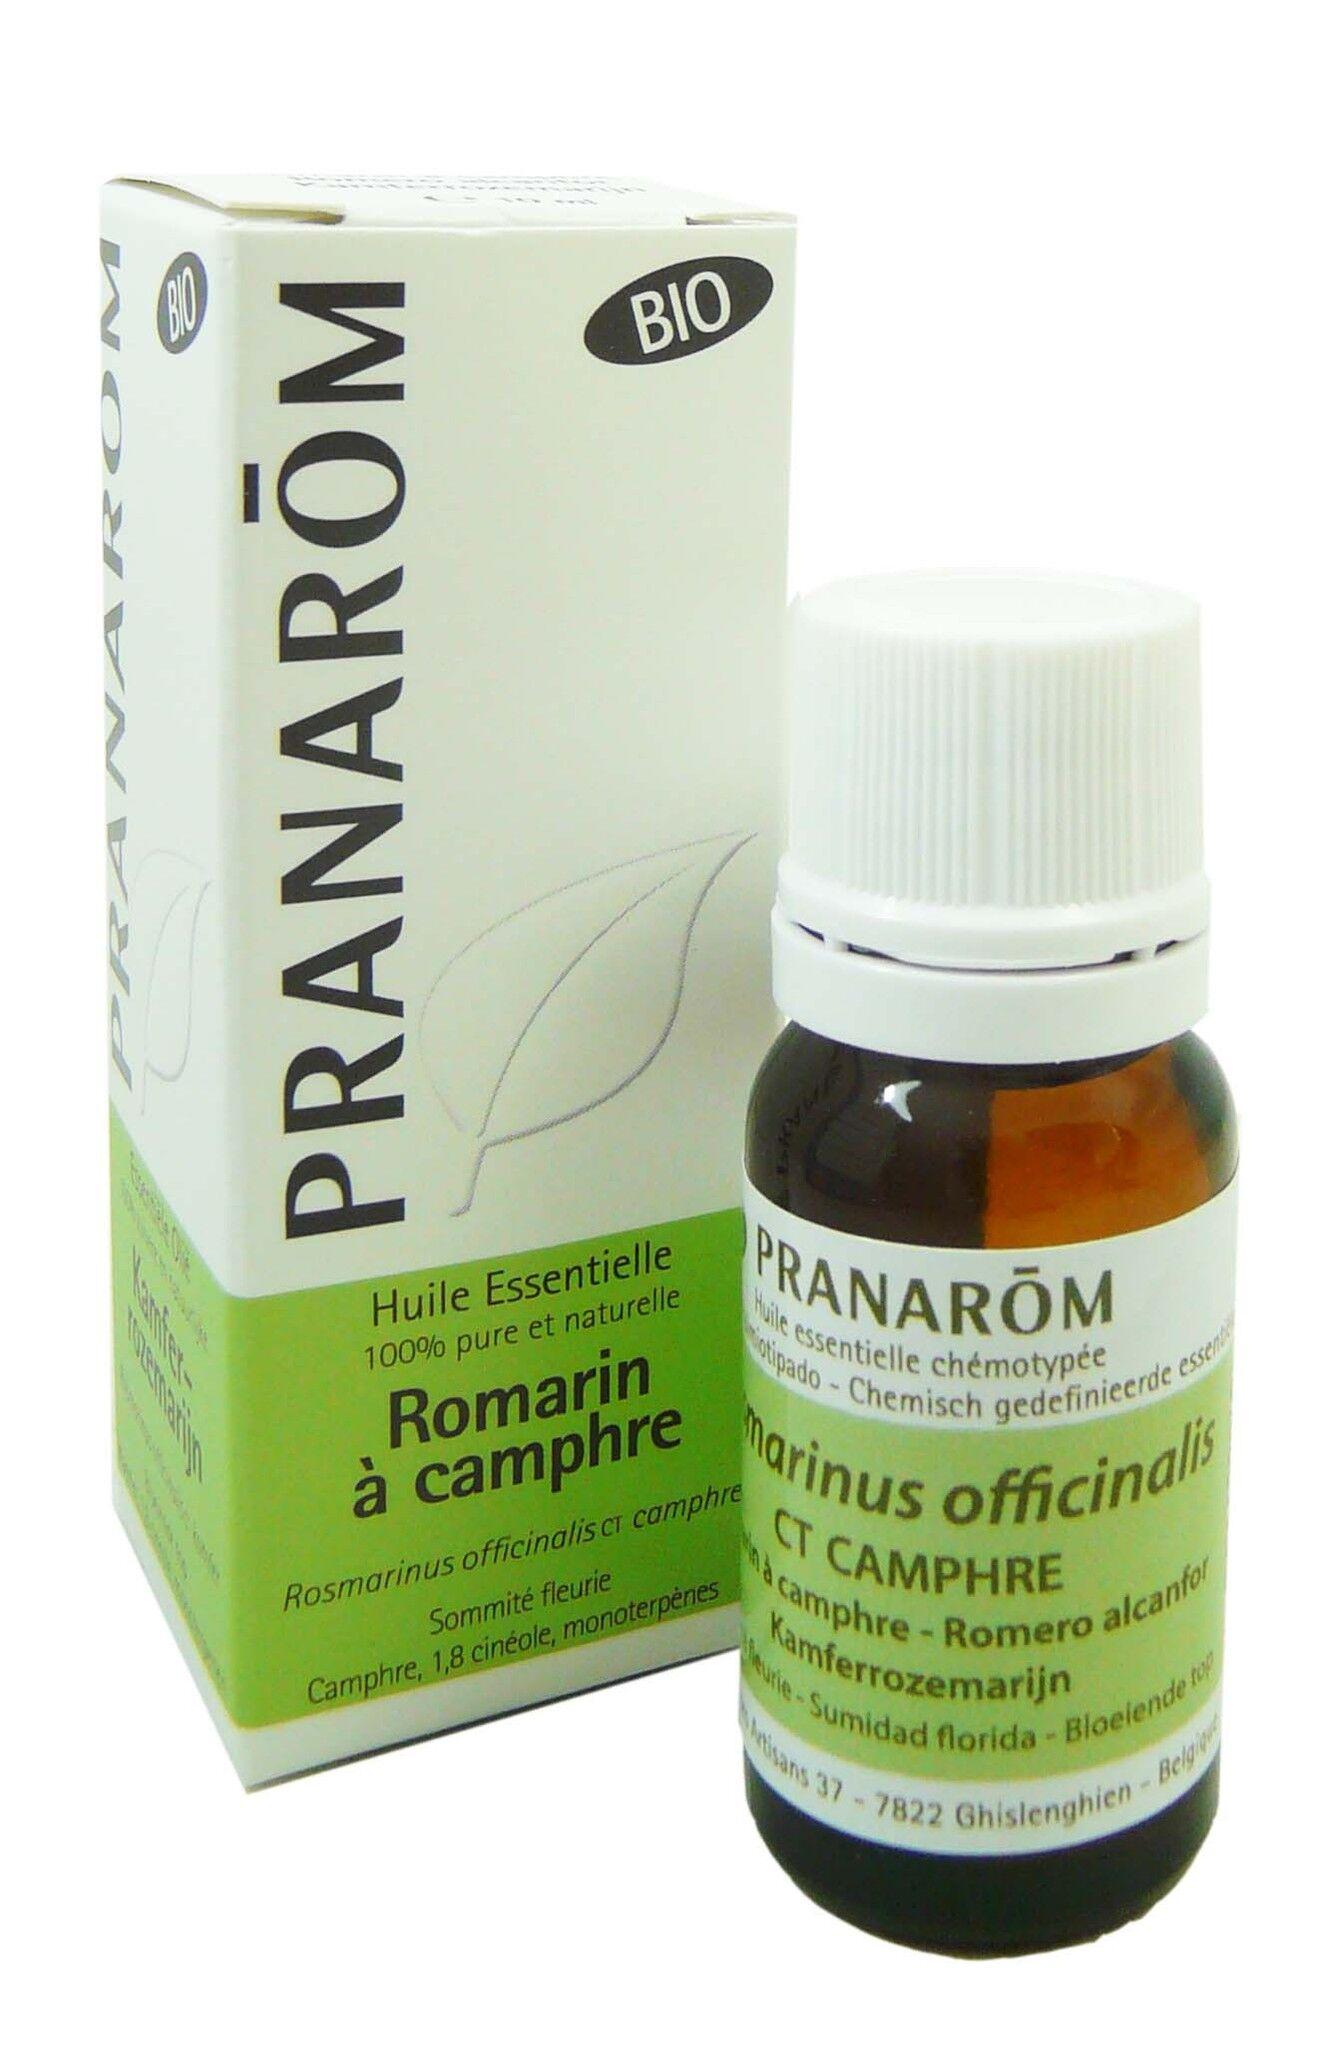 Pranarom huile essentielle bio romarin a camphre 10ml